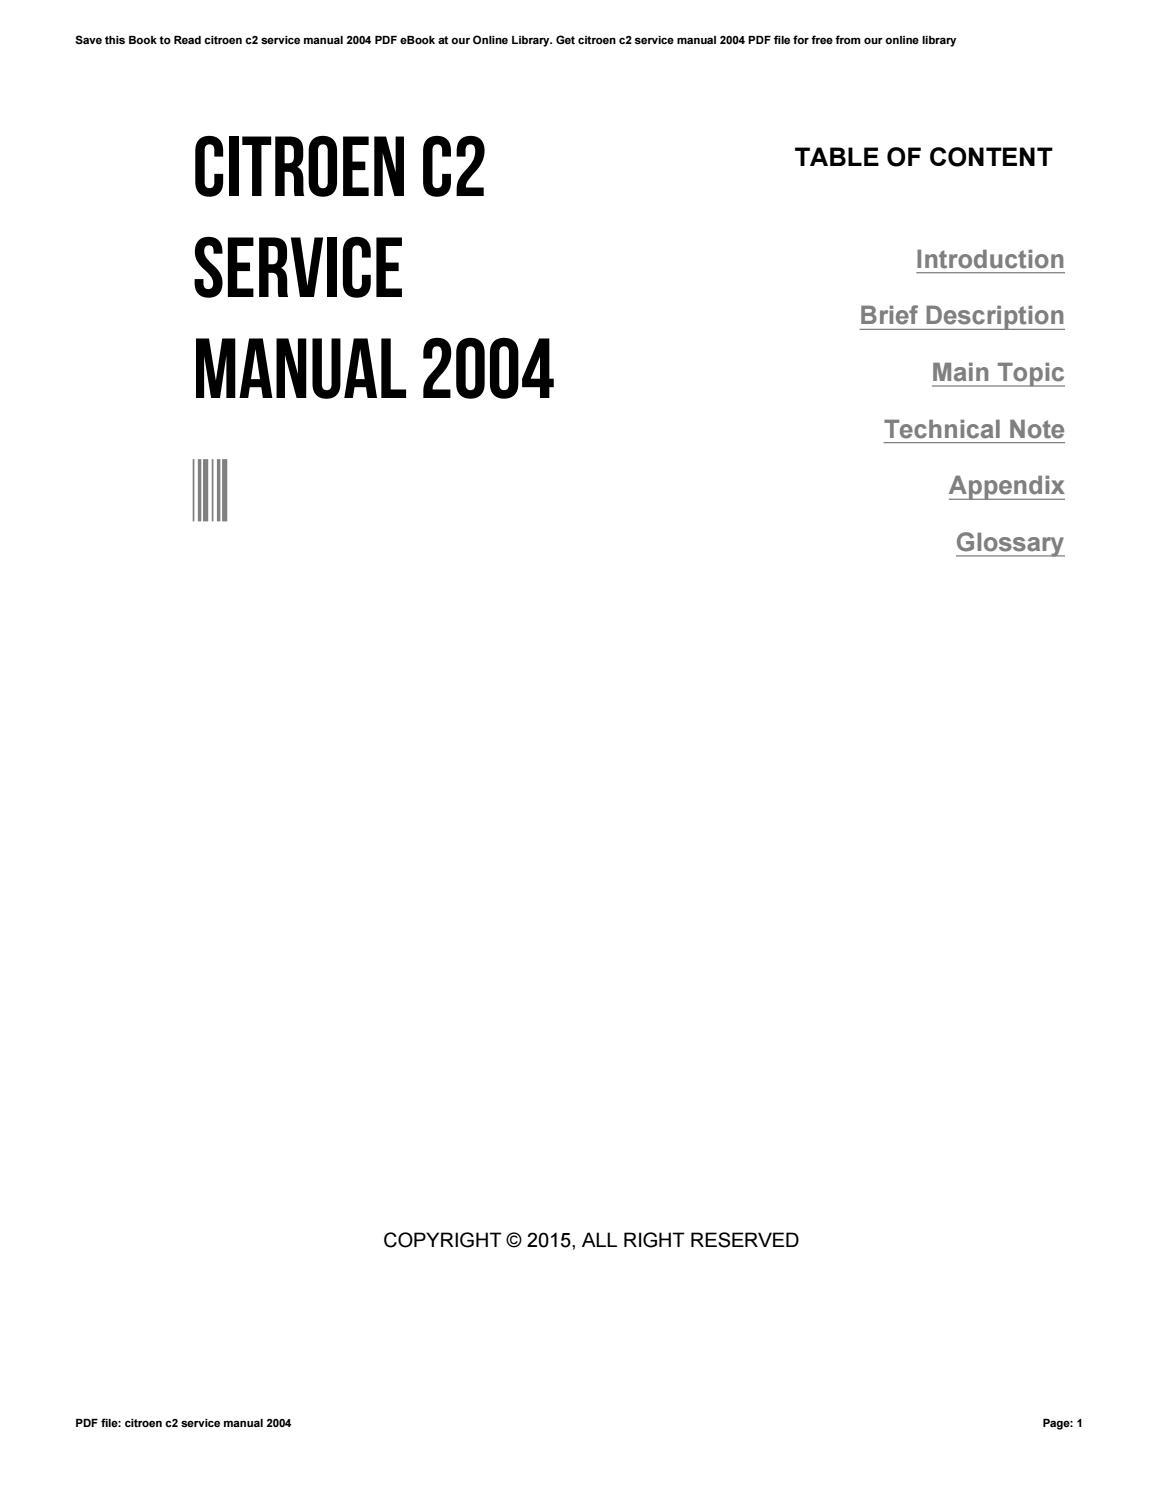 citroen c2 service manual 2004 by harvard ac uk8 issuu rh issuu com citroen c2 owners workshop manual citroen c2 vtr service manual